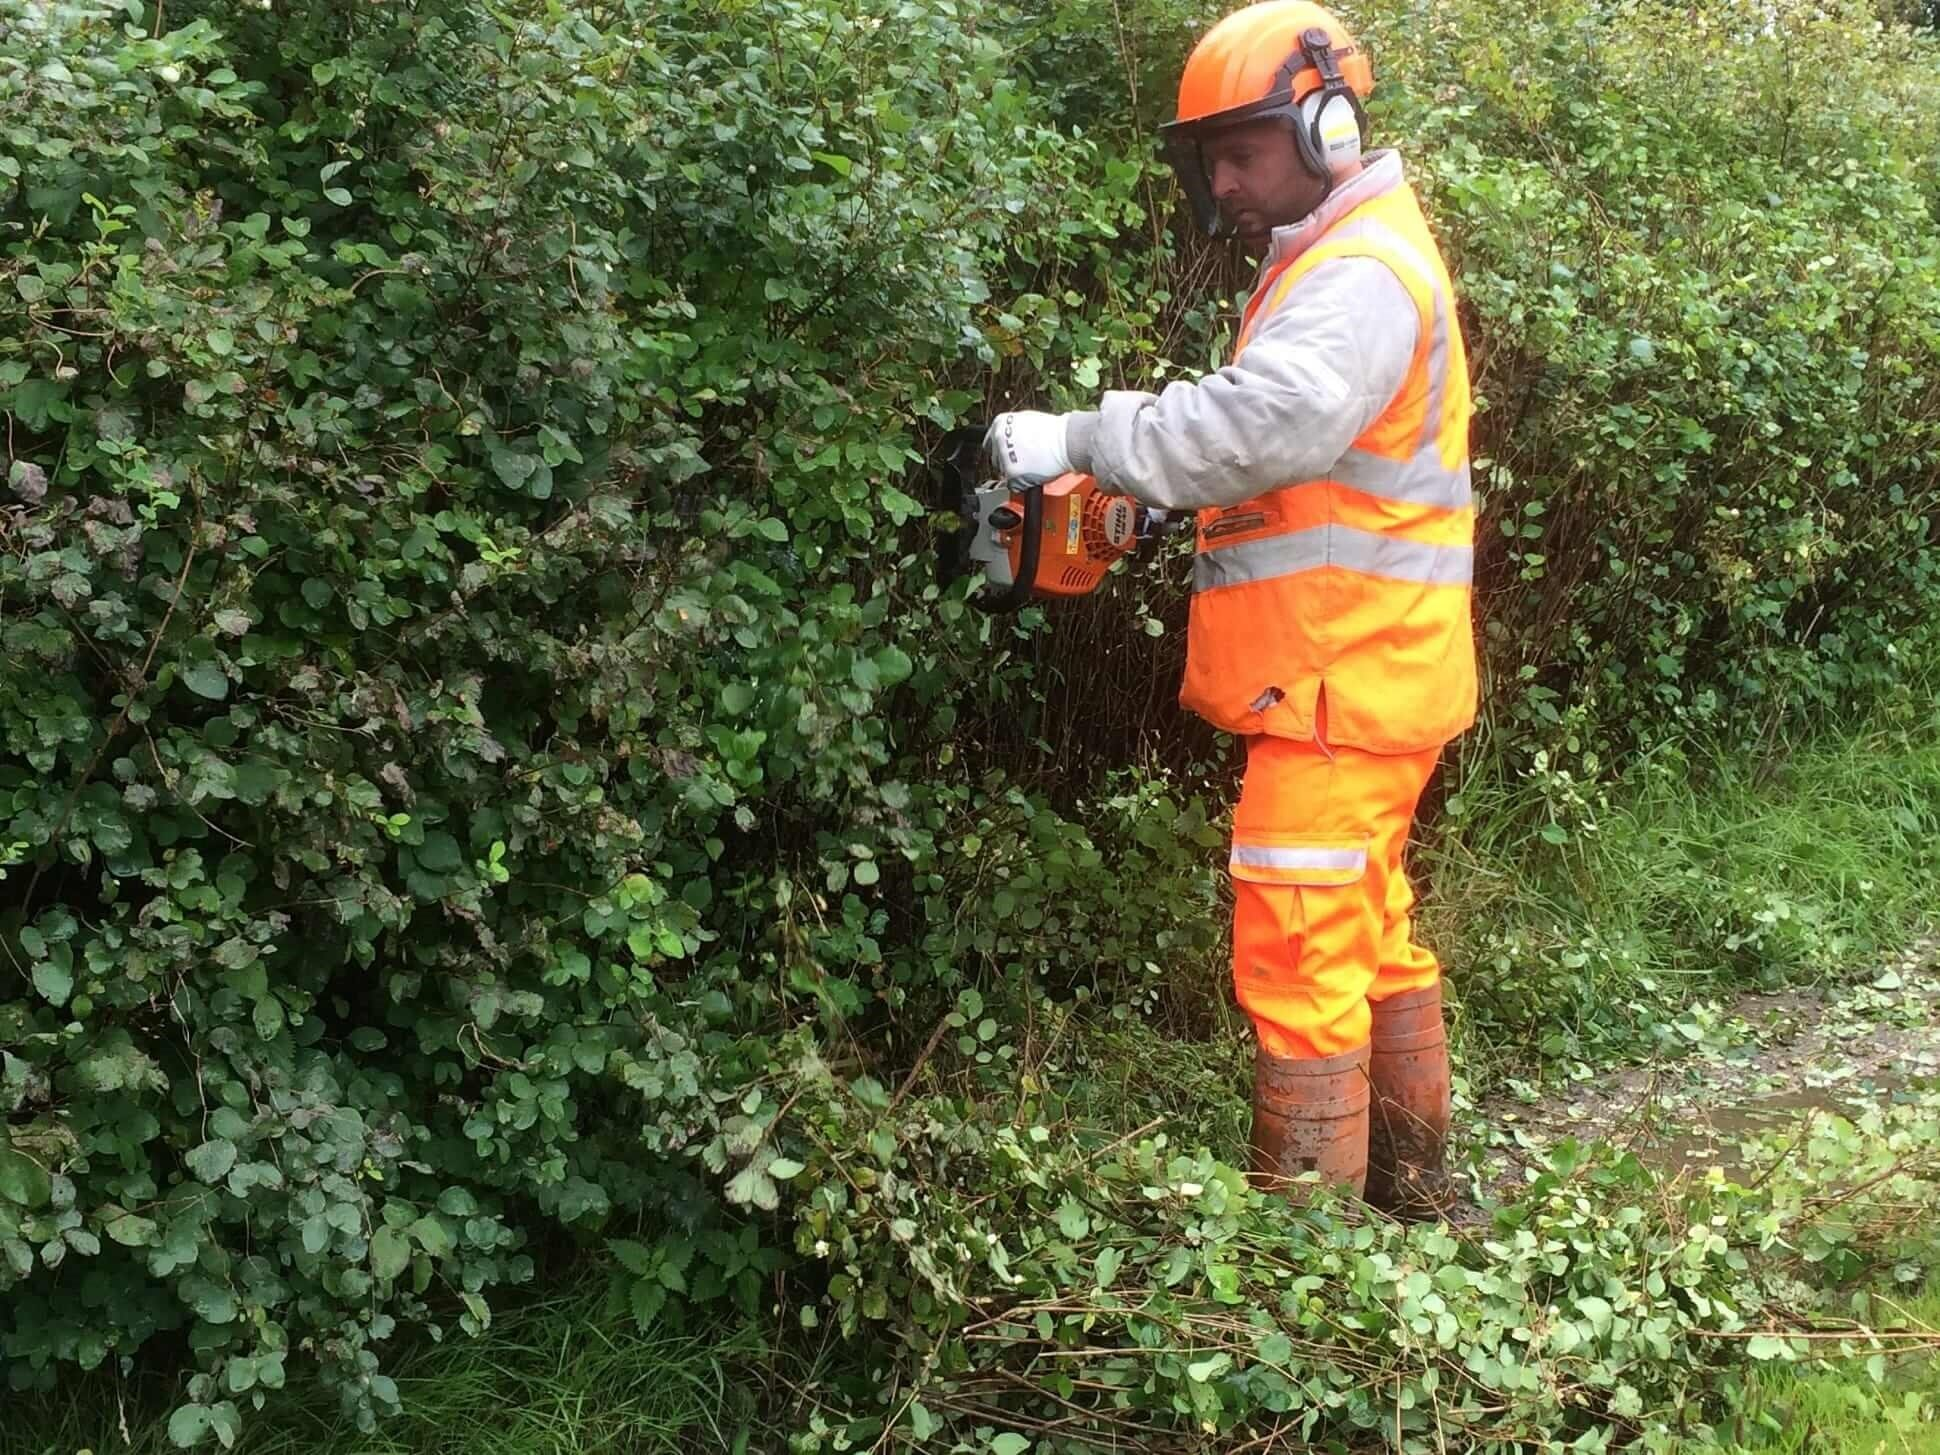 Lowe-Maintenance-Handheld-Hedge-Cutter-Integrated